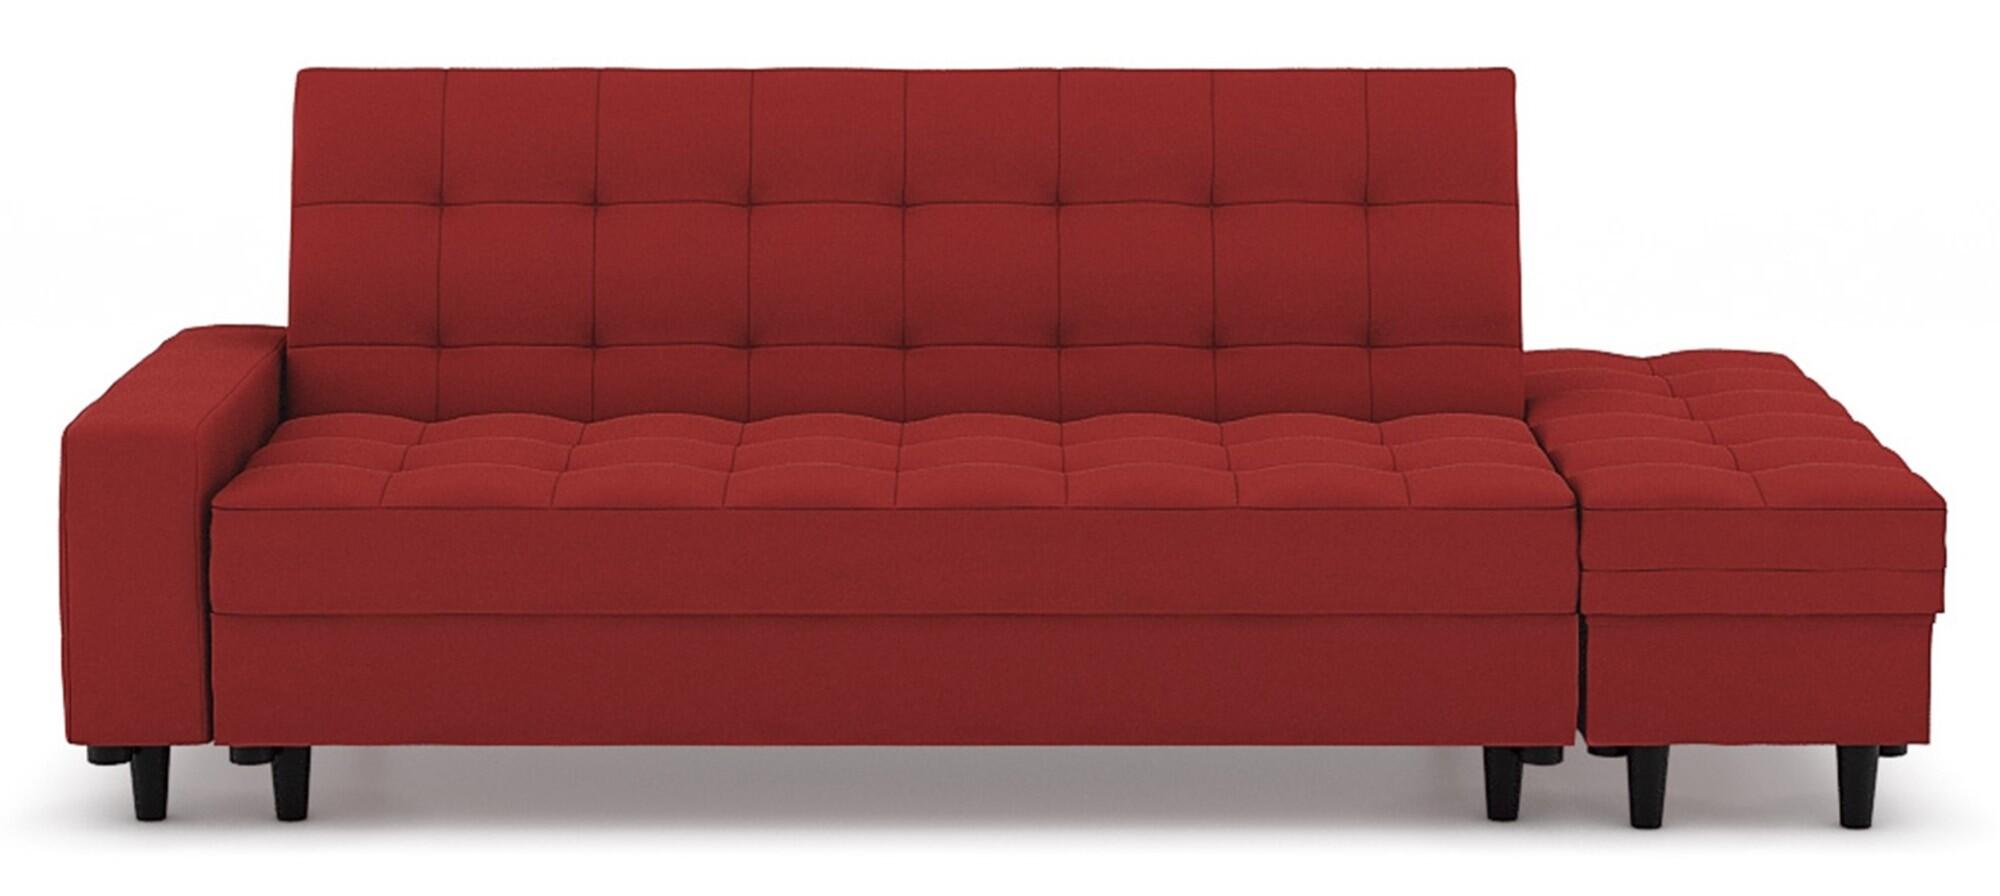 Thora Multi Storage Sofa Bed Fabric